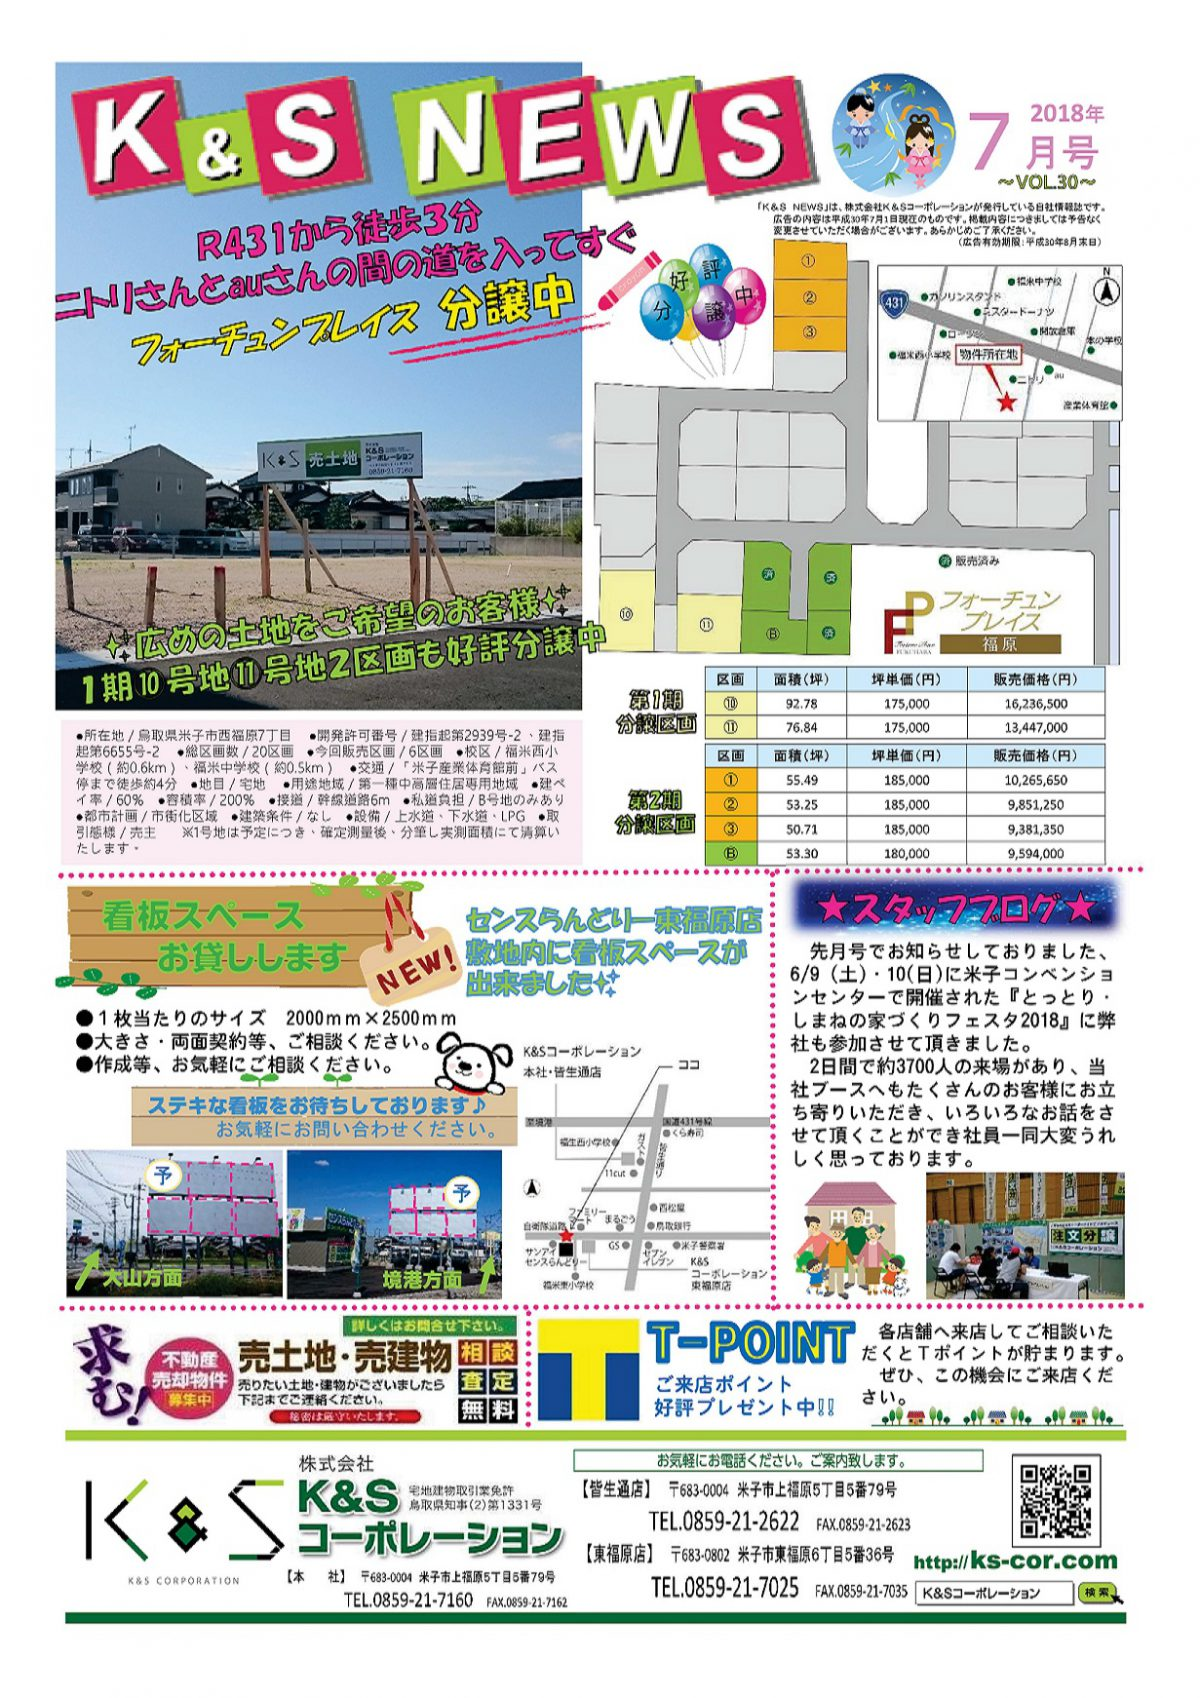 K&S NEWS 7月号